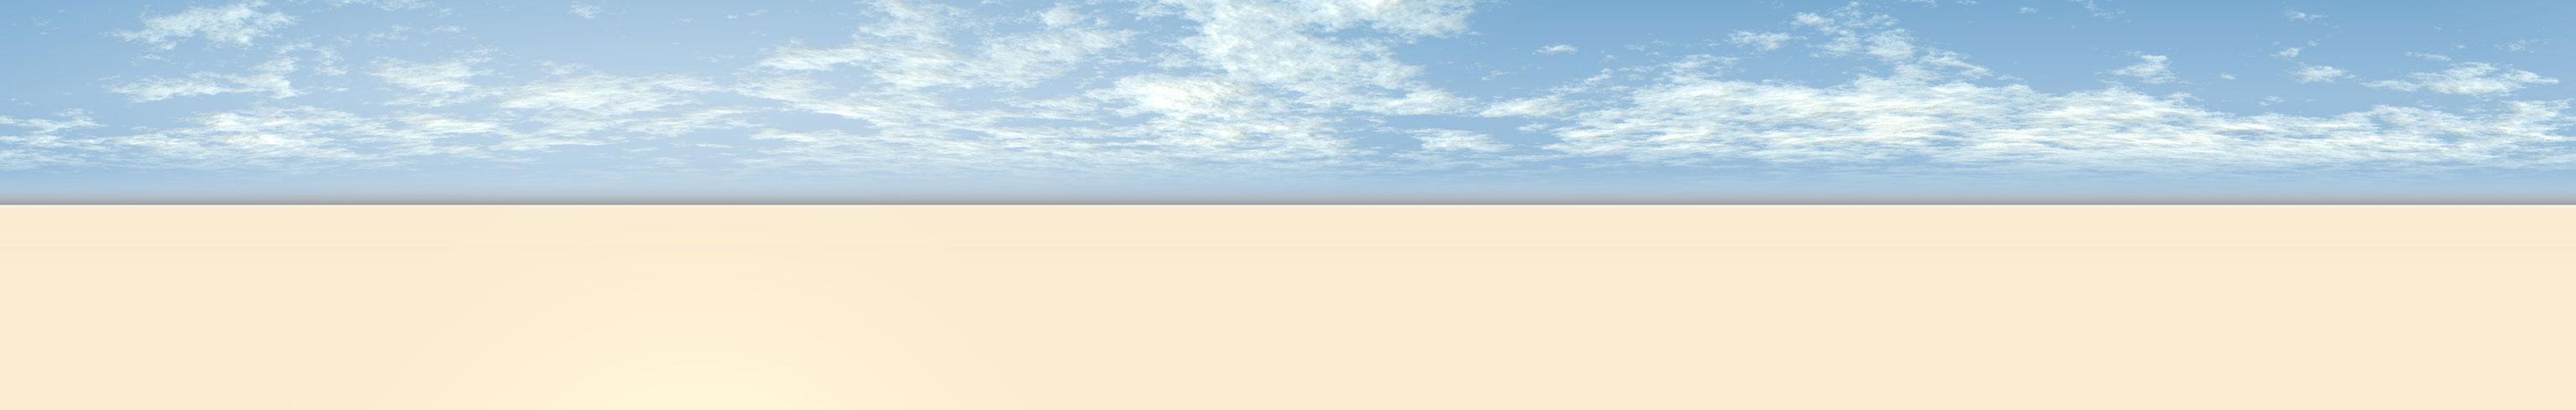 Panoramic sky, en Cielos – Objetos paisajísticos